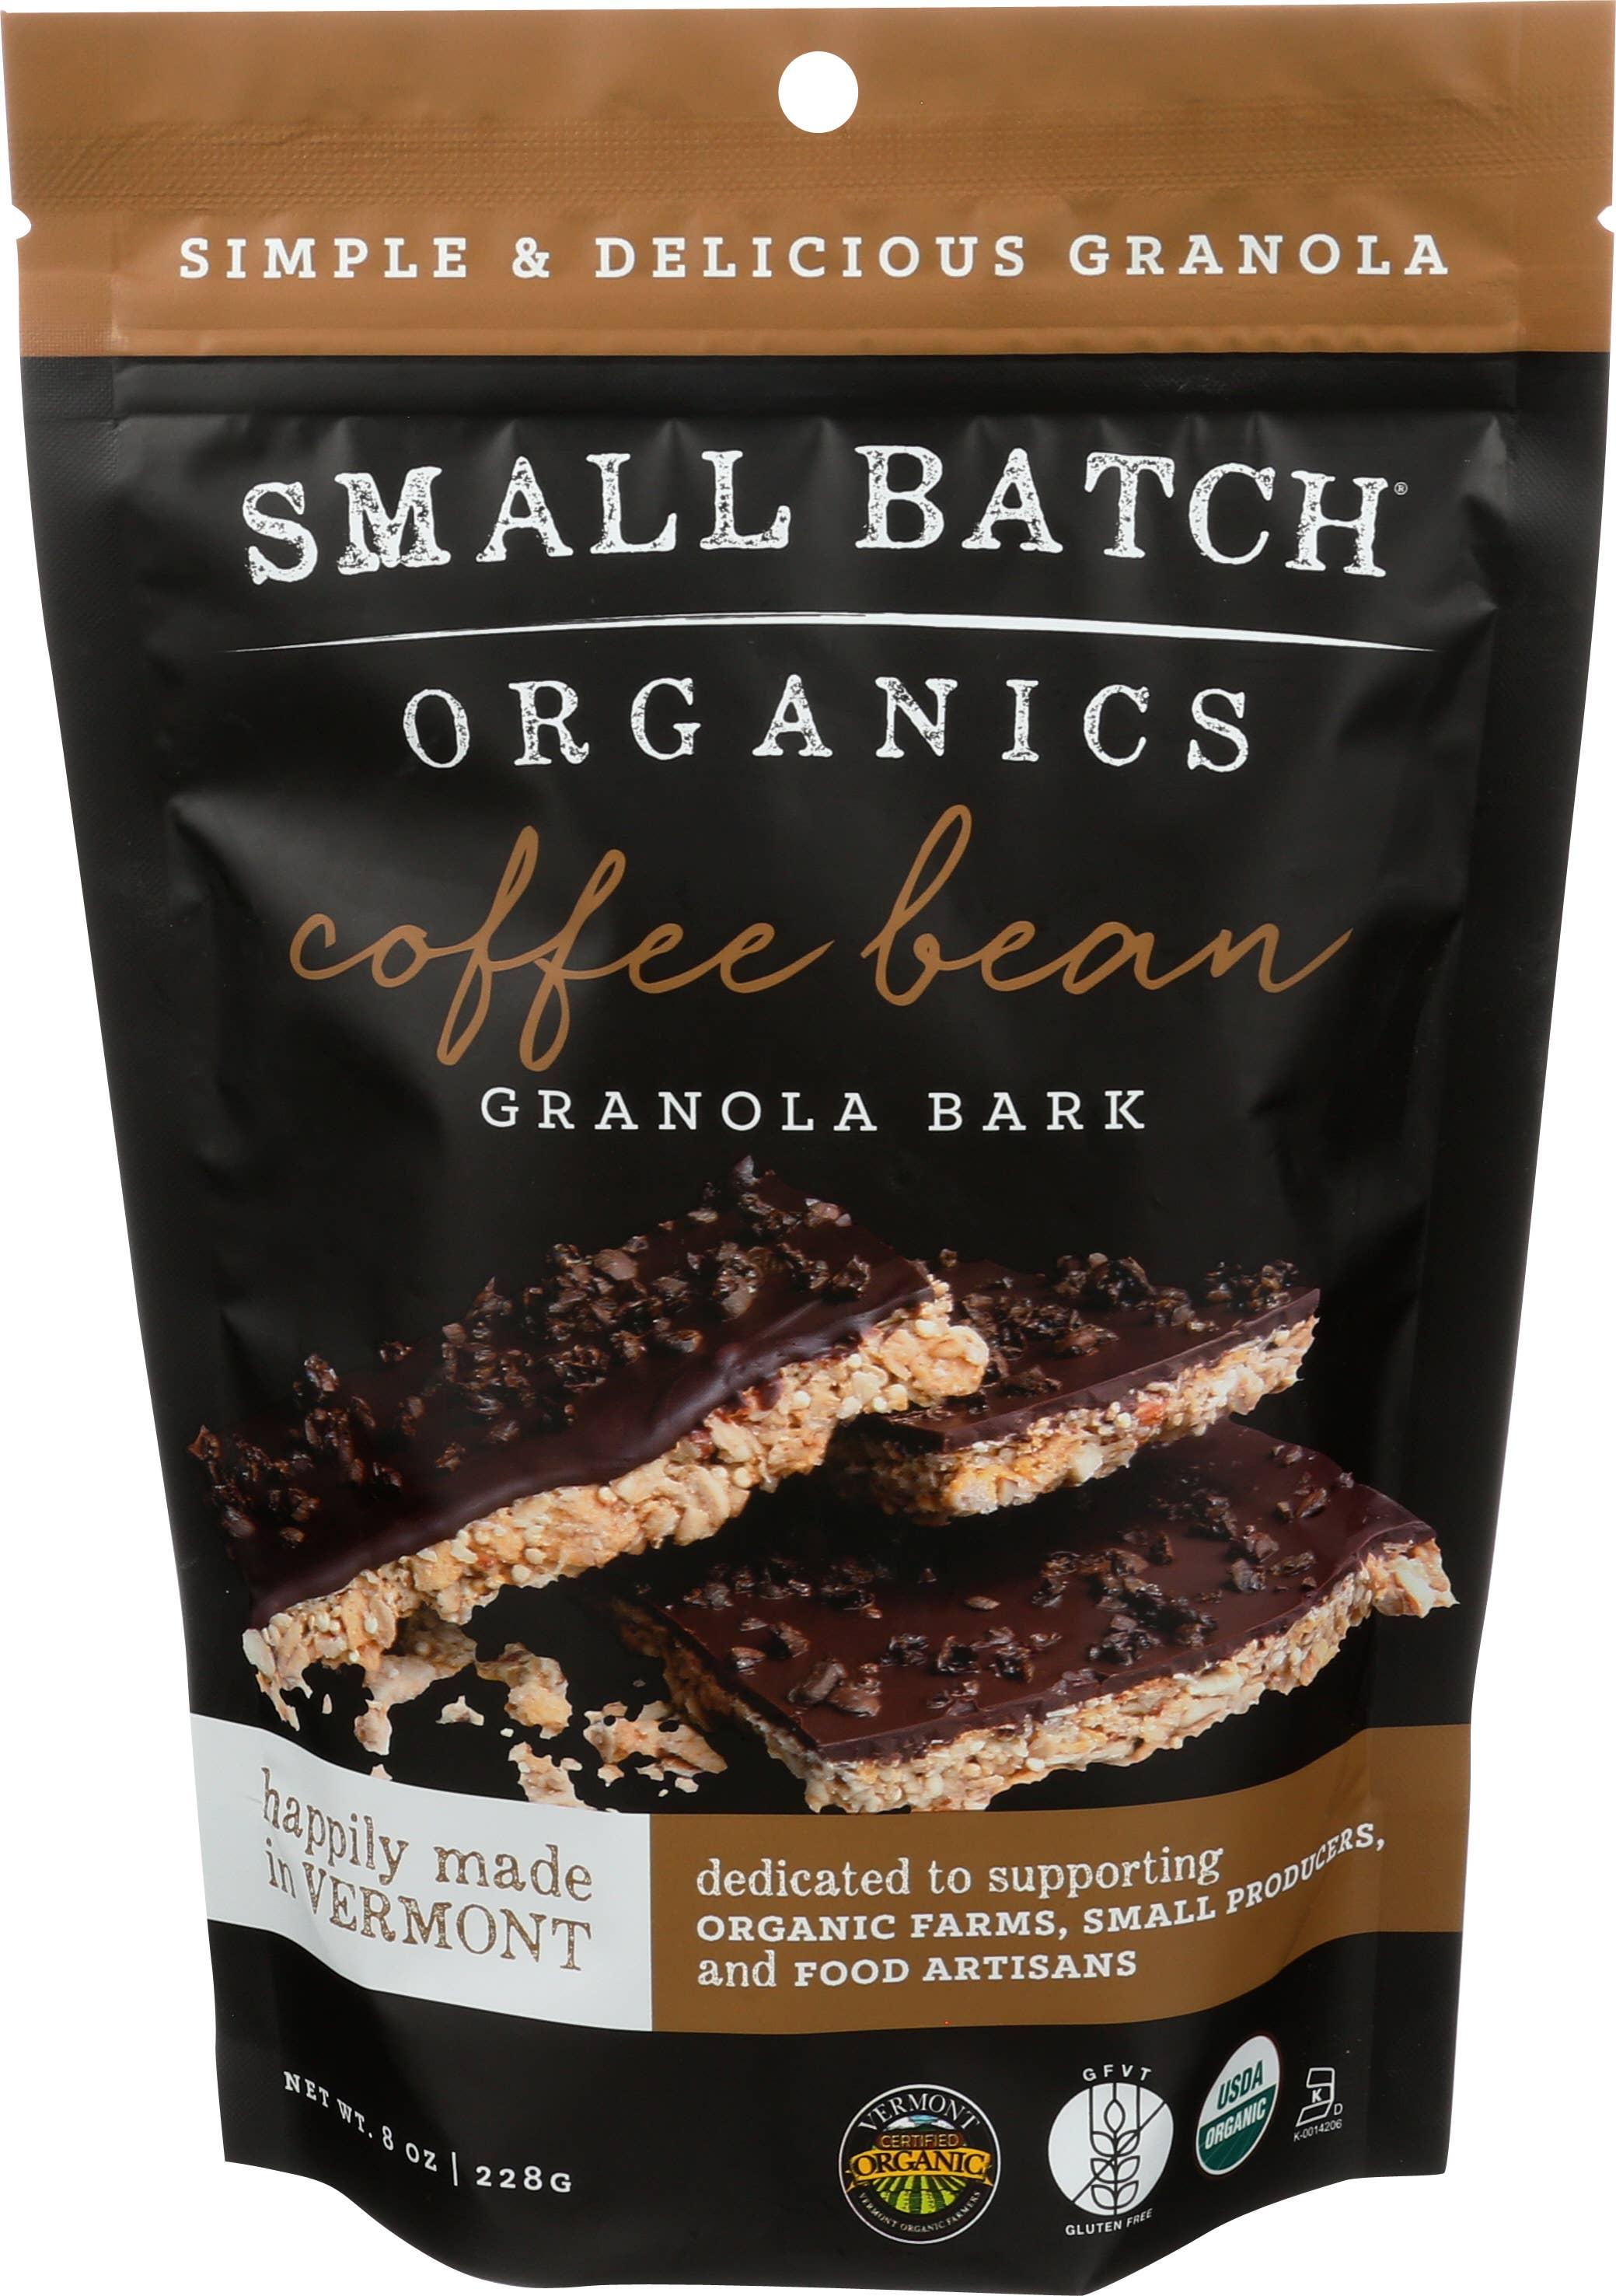 8oz Coffee Bean Granola Bark | Trada Marketplace